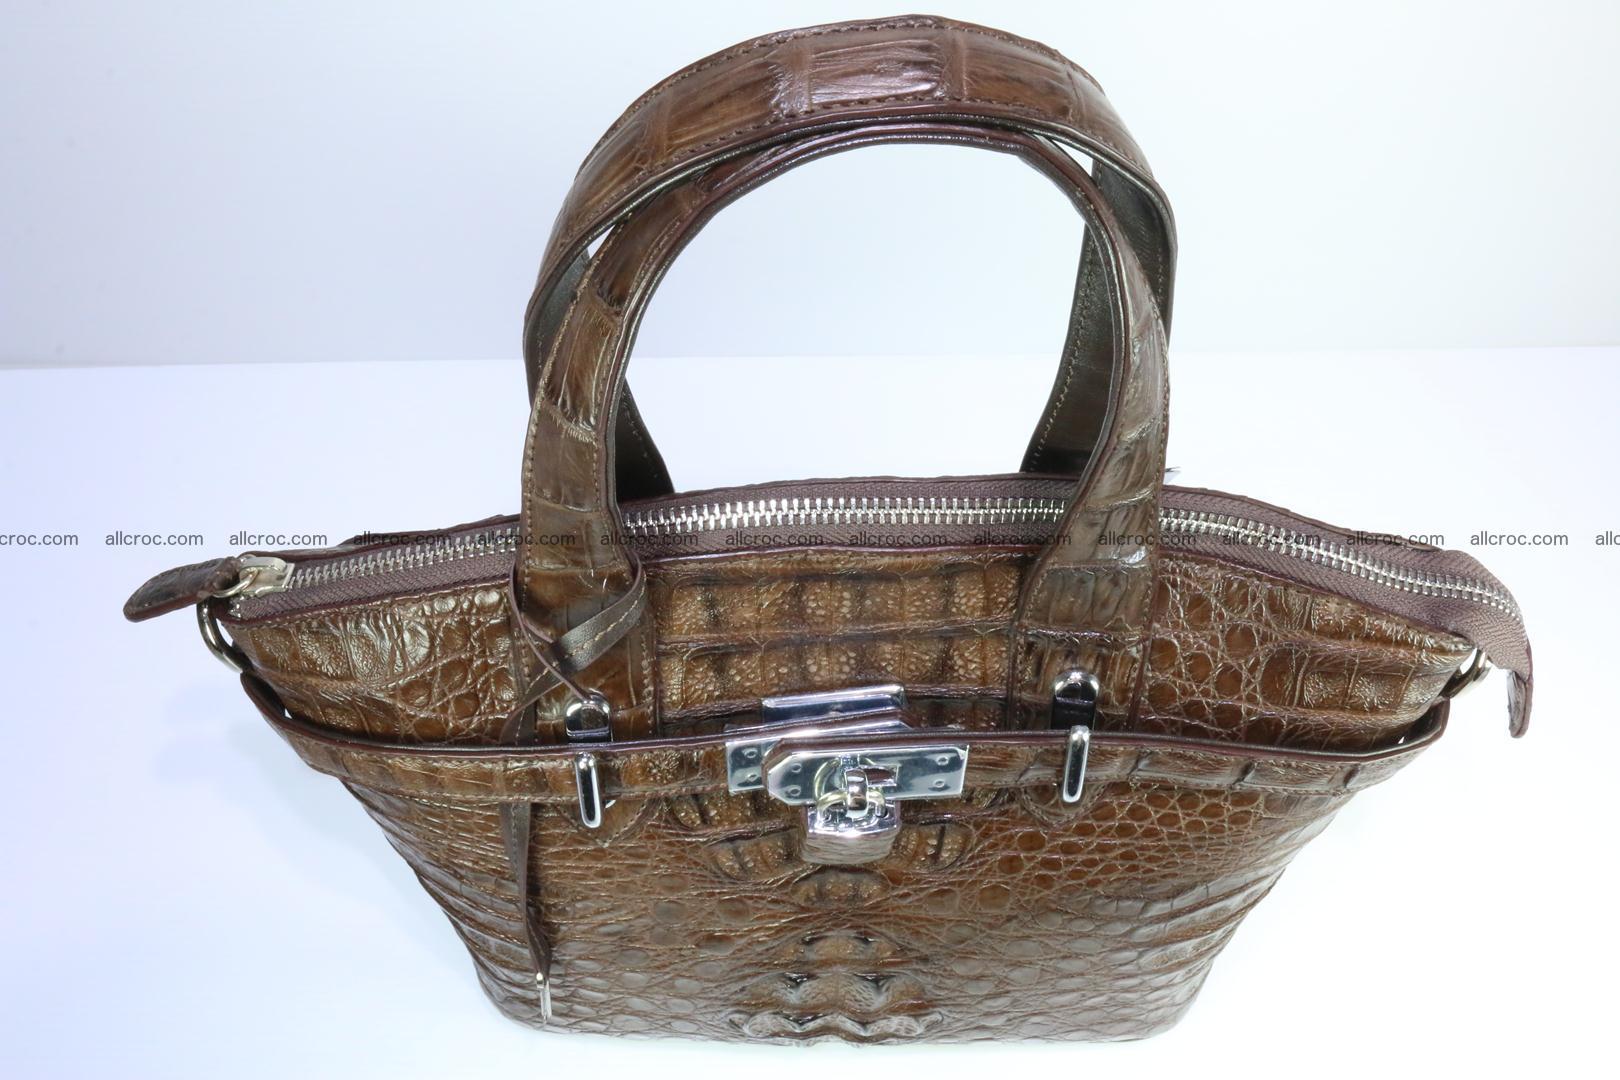 Genuine crocodile handbag for ladies 050 Foto 6